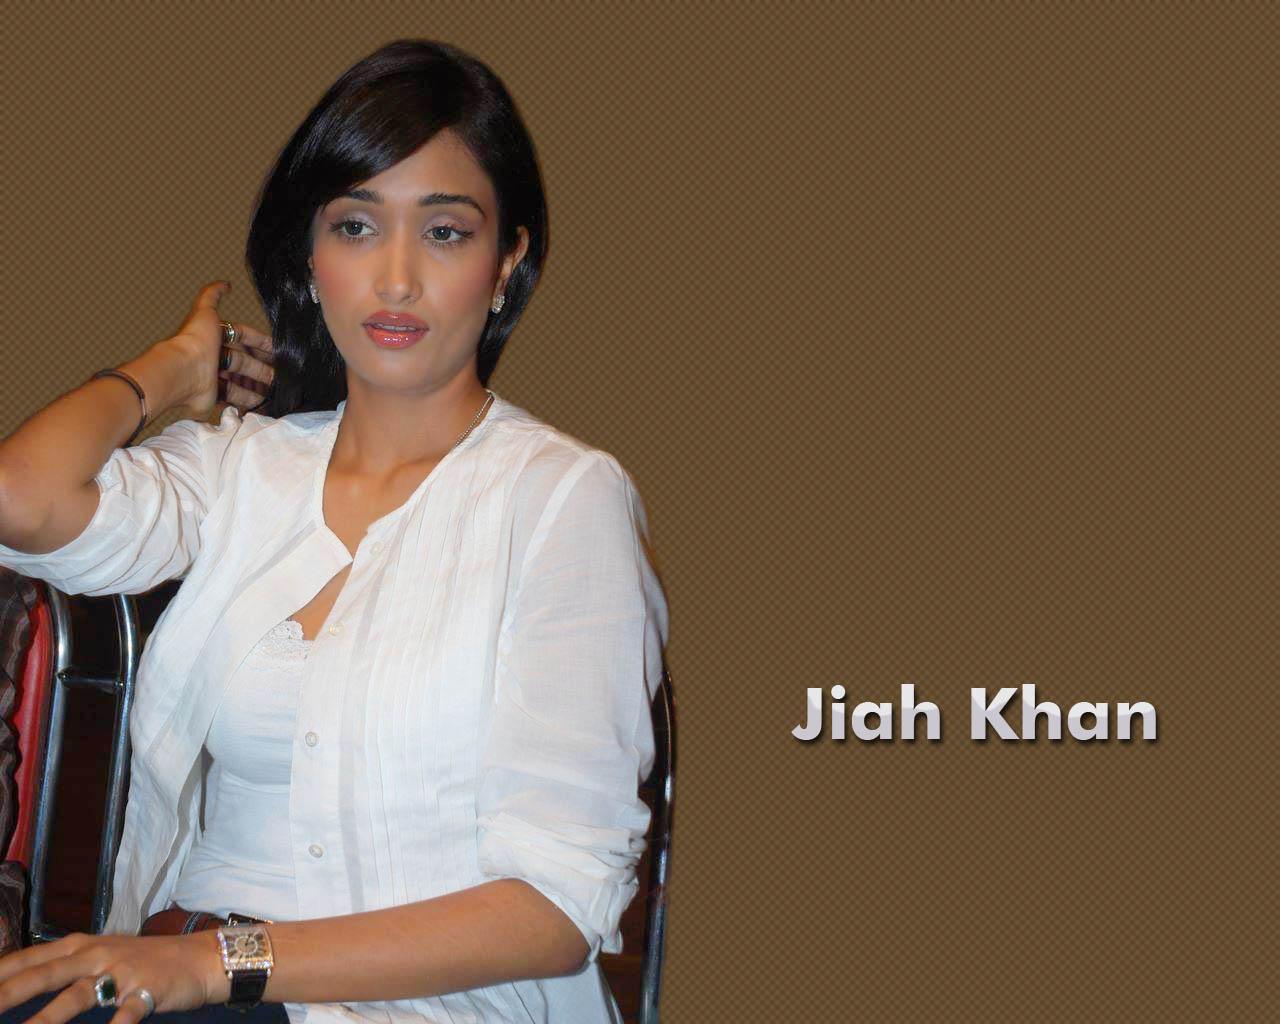 Jiah Khan Hot topless pics